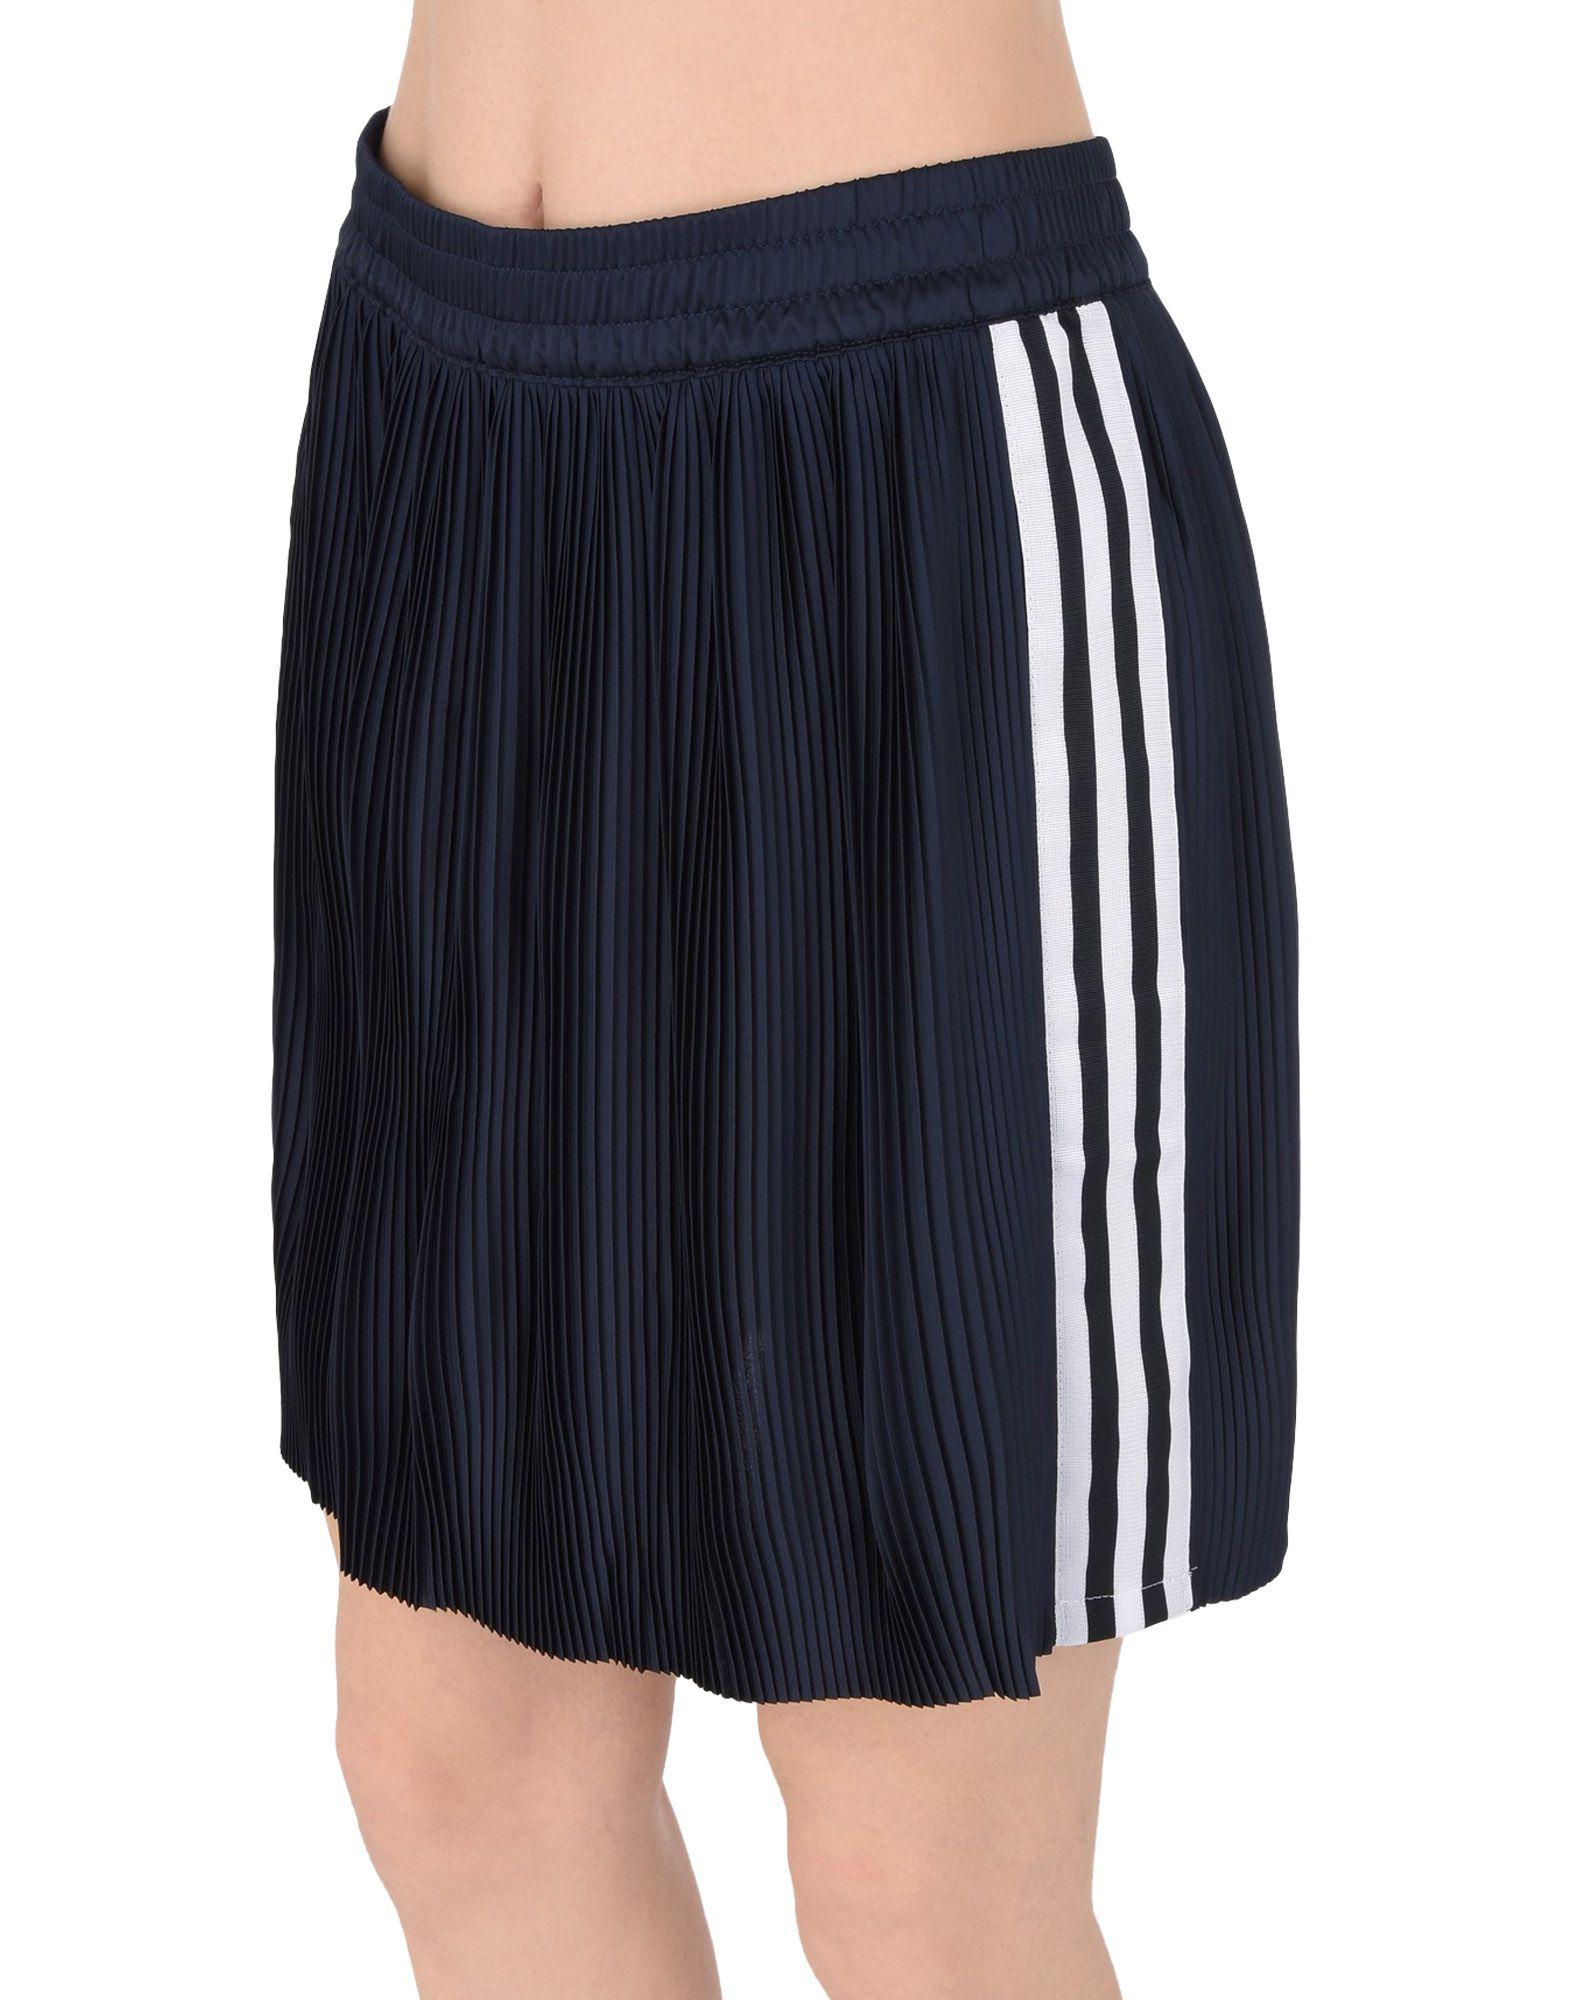 ADIDAS ORIGINALS Мини-юбка adidas originals мини юбка